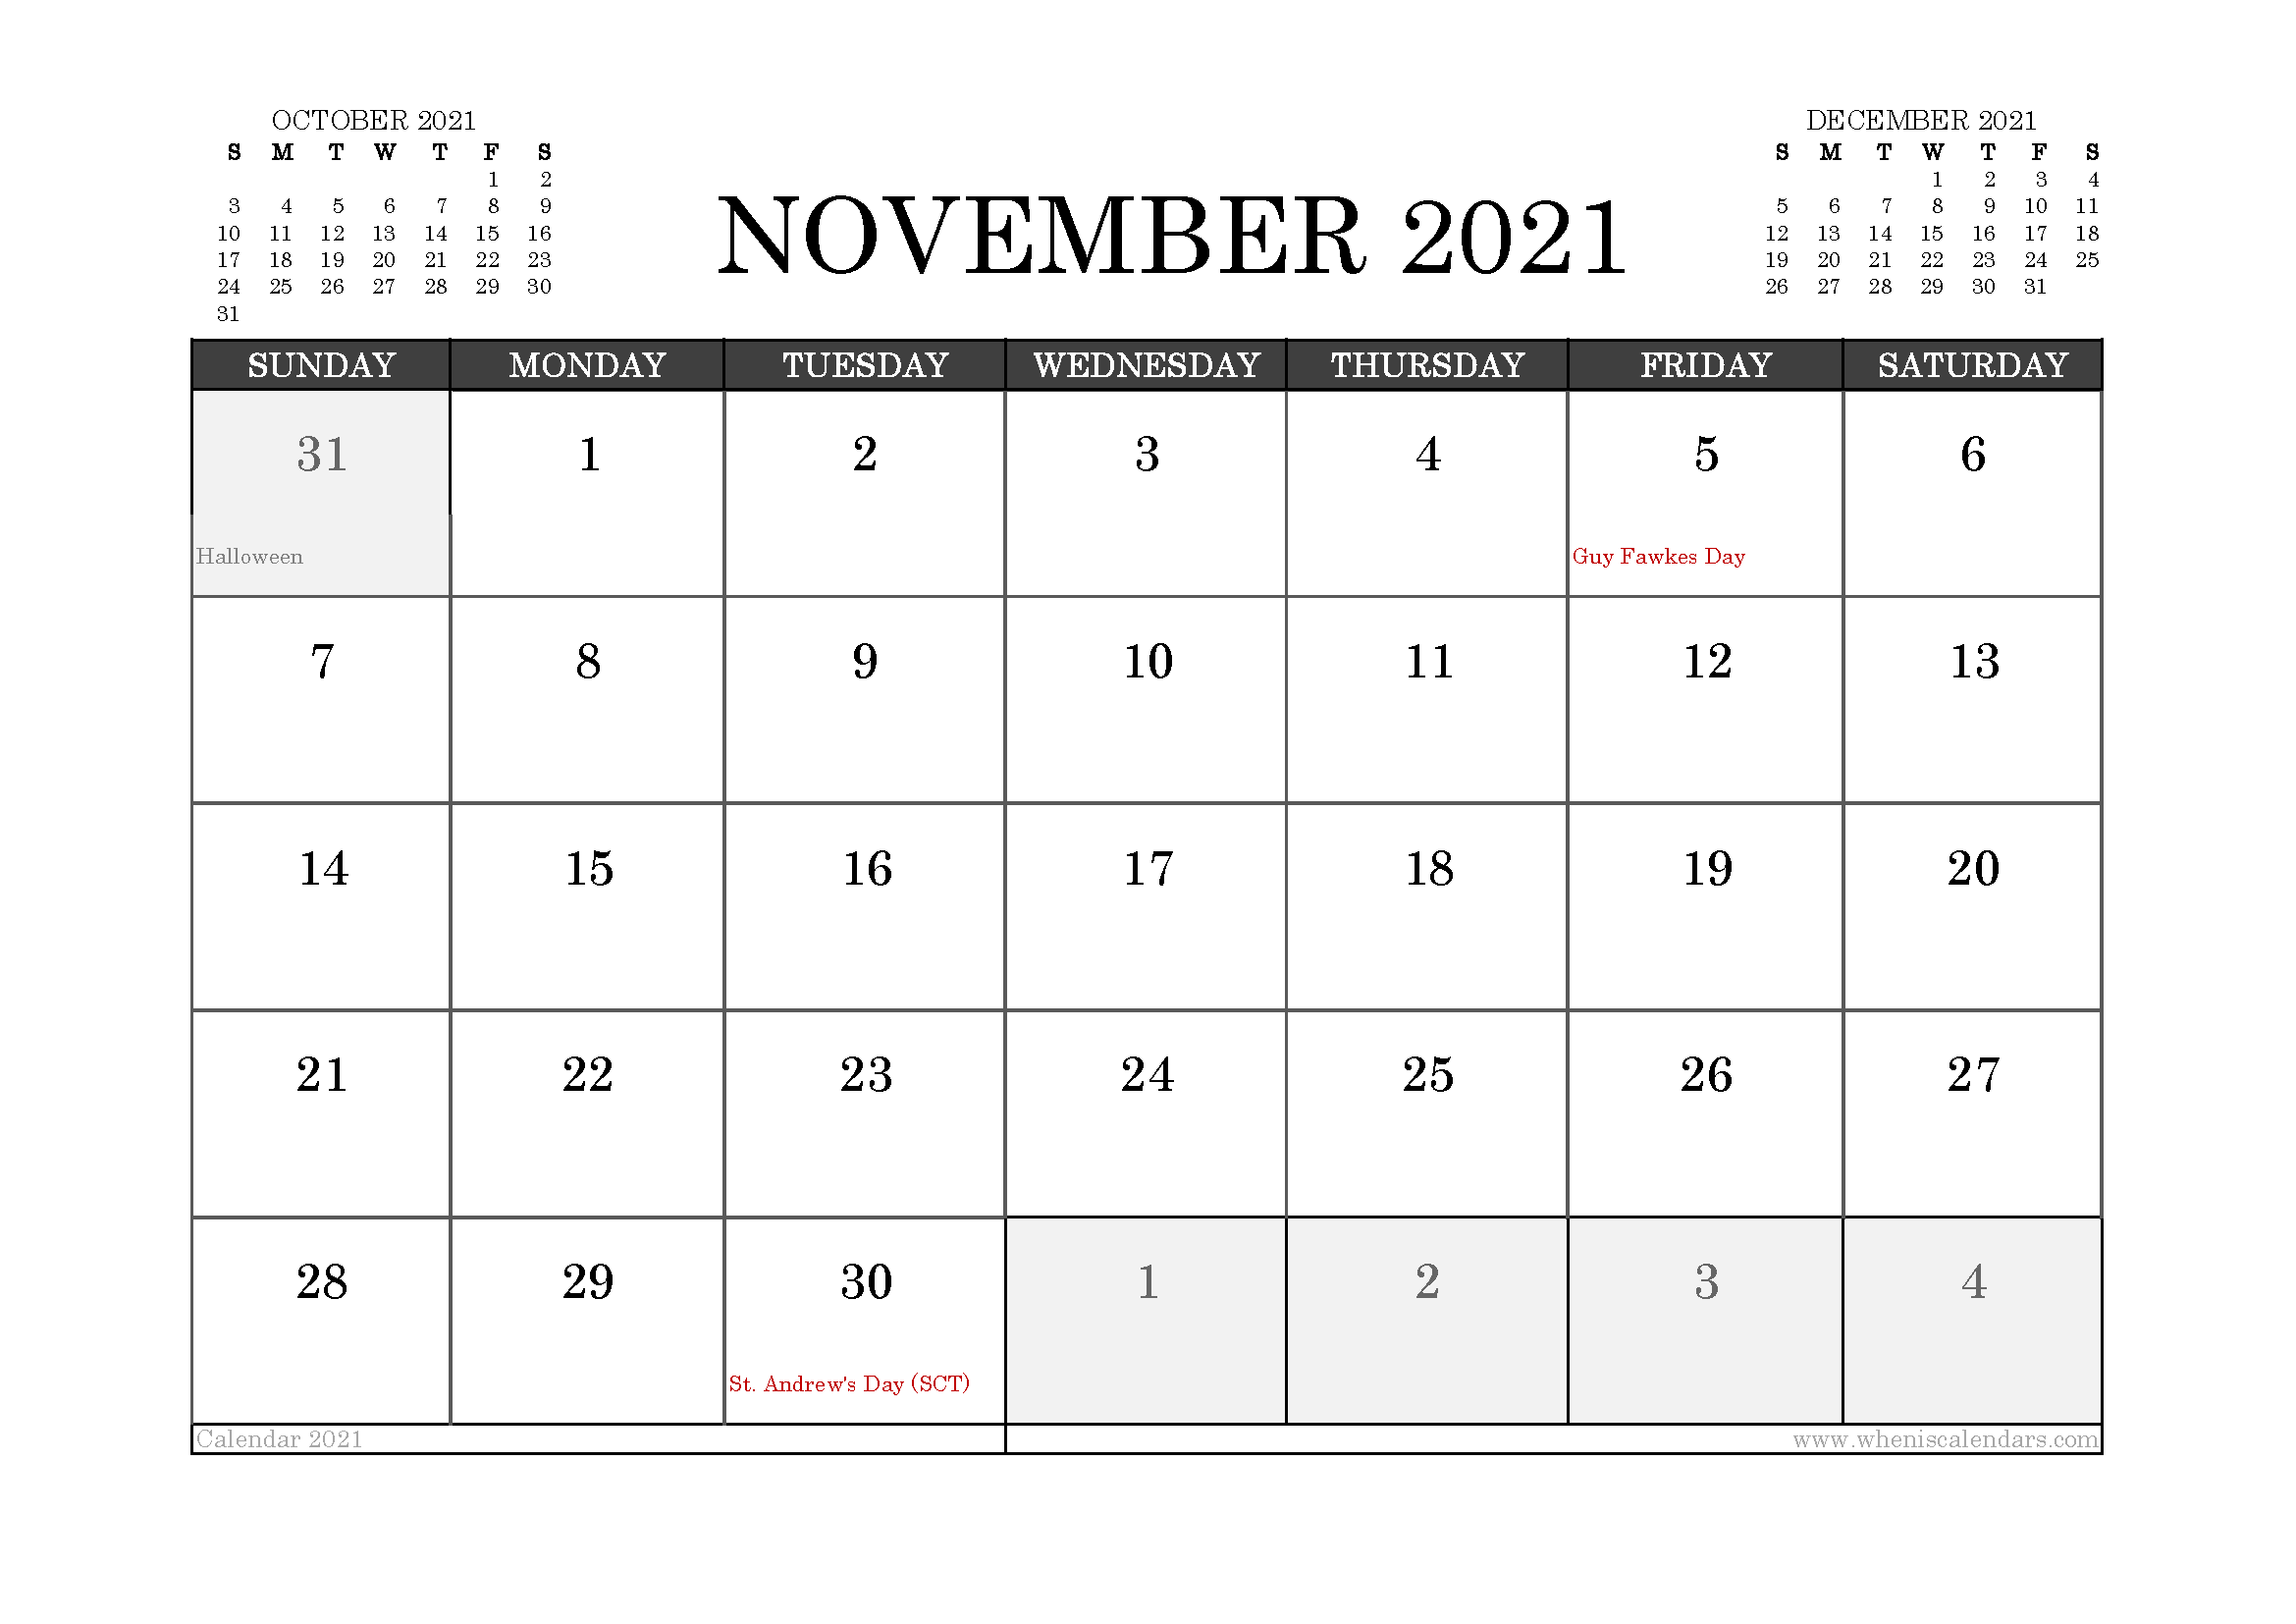 November 2021 Calendar UK with Holidays